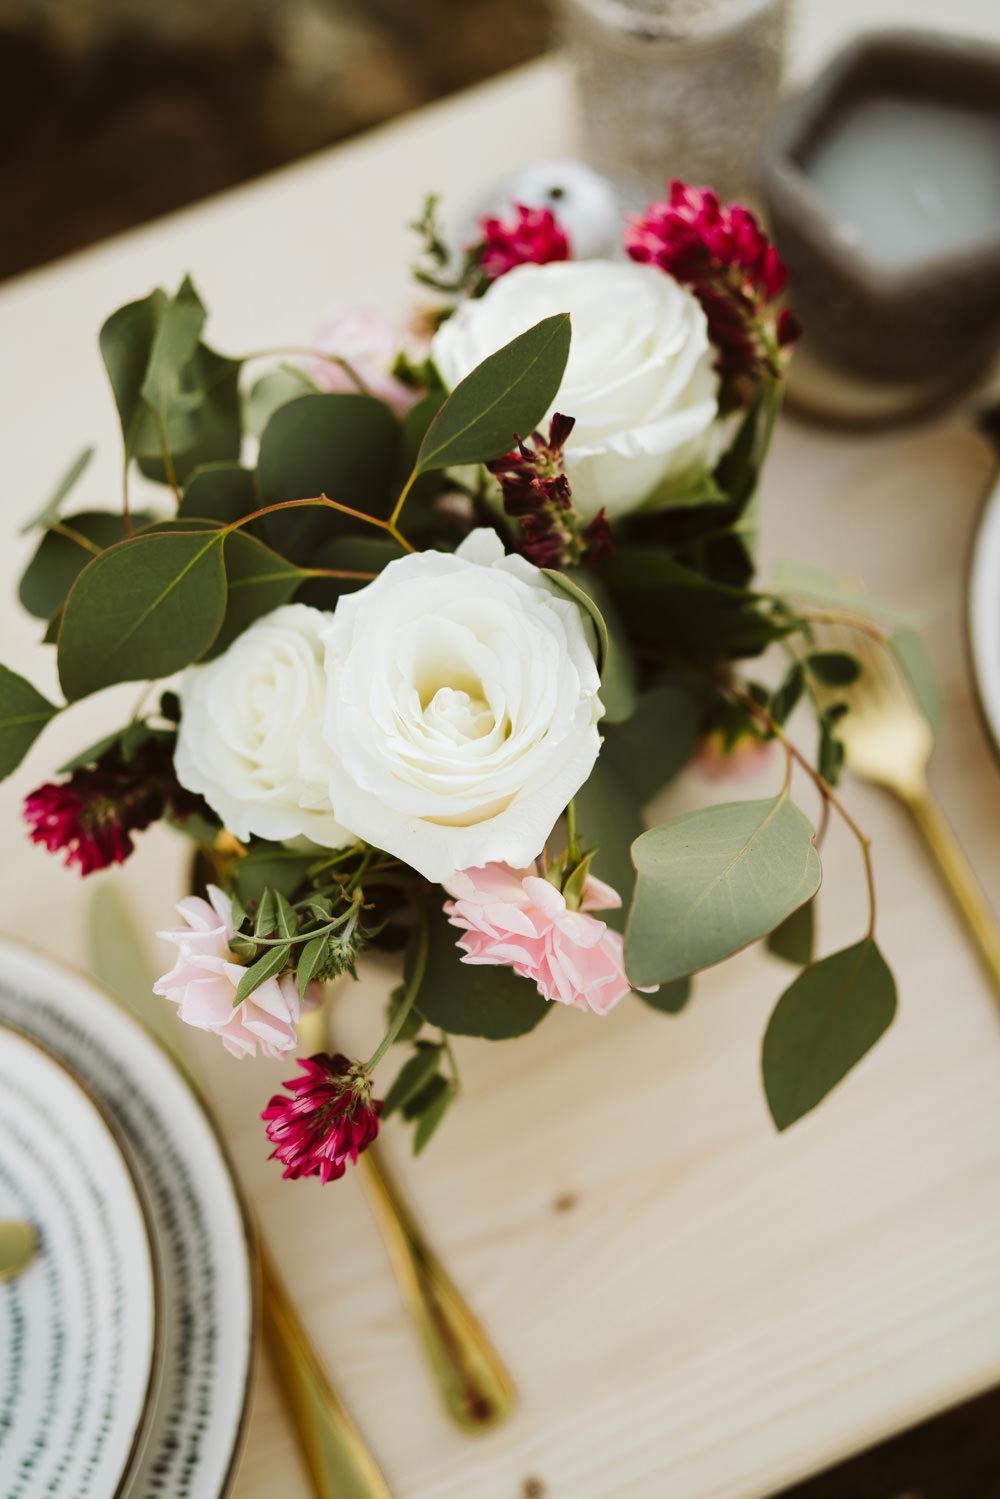 Table Flowers Foliage Greenery Rose Berry Clifftop Portugal Wedding Ideas John Barwood Photography